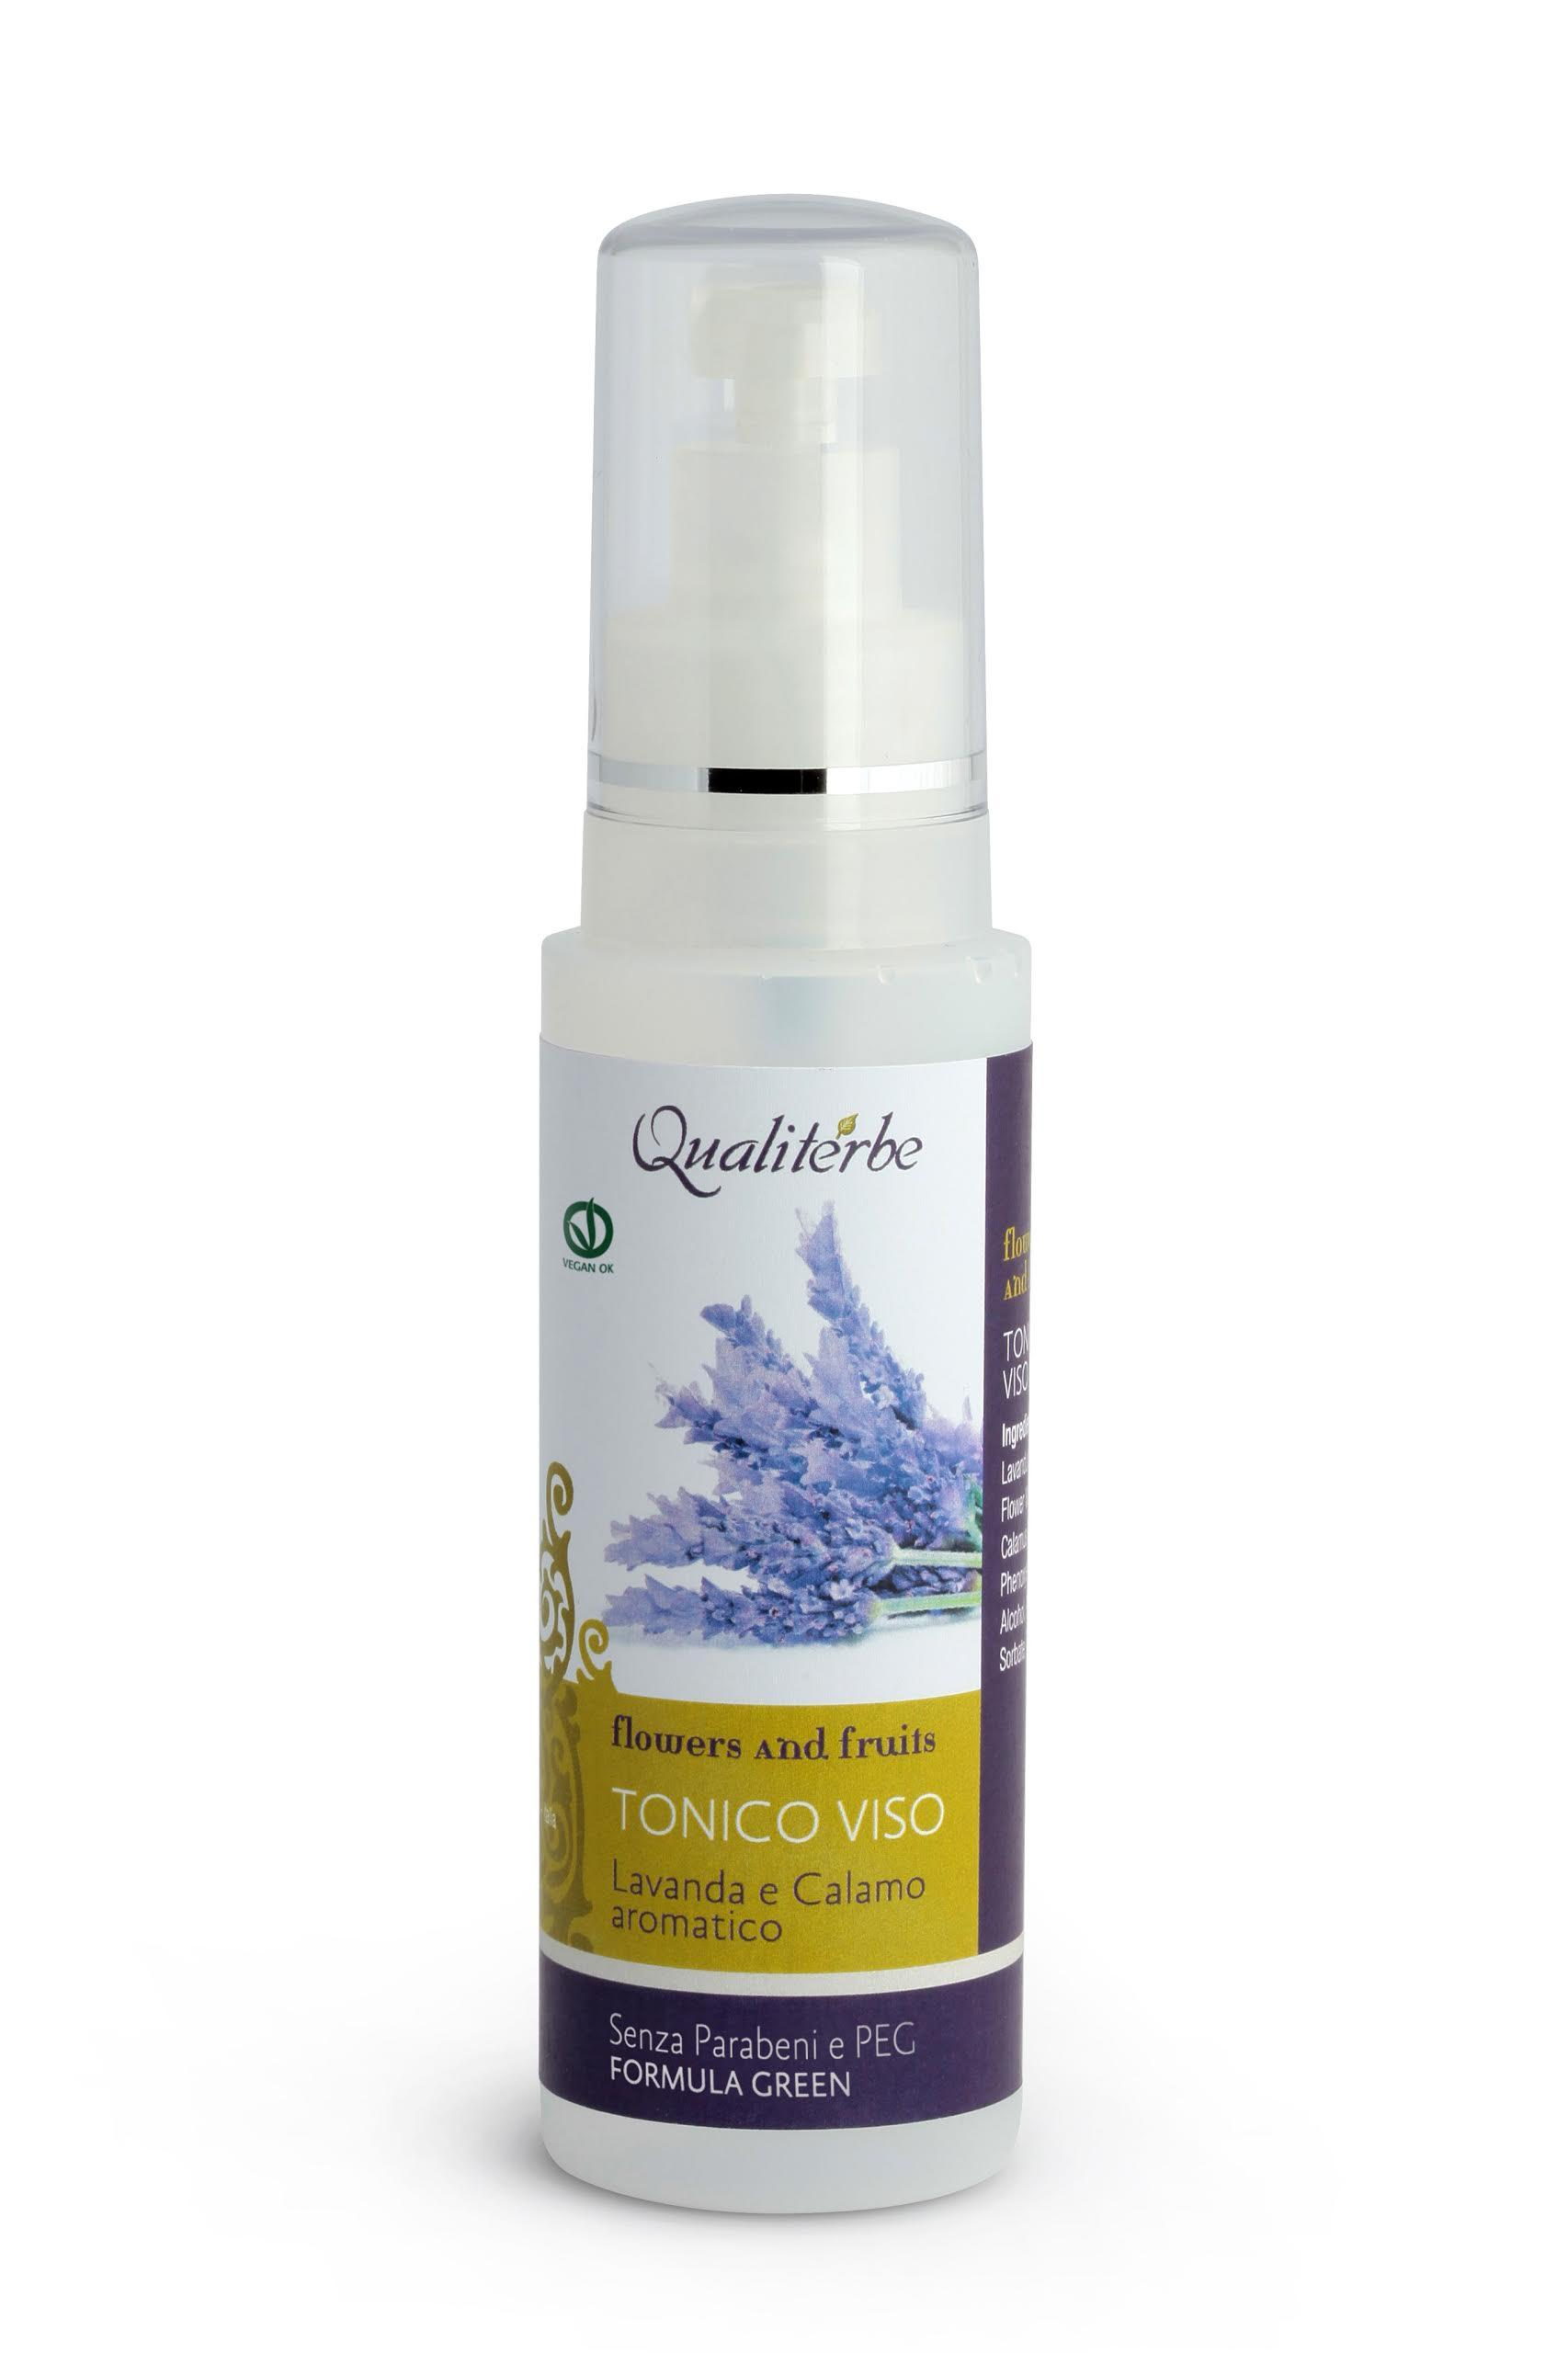 FORMULA GREEN Tonico Viso 125 ml - Linea Flowers and Fruits - (Vegan ok)